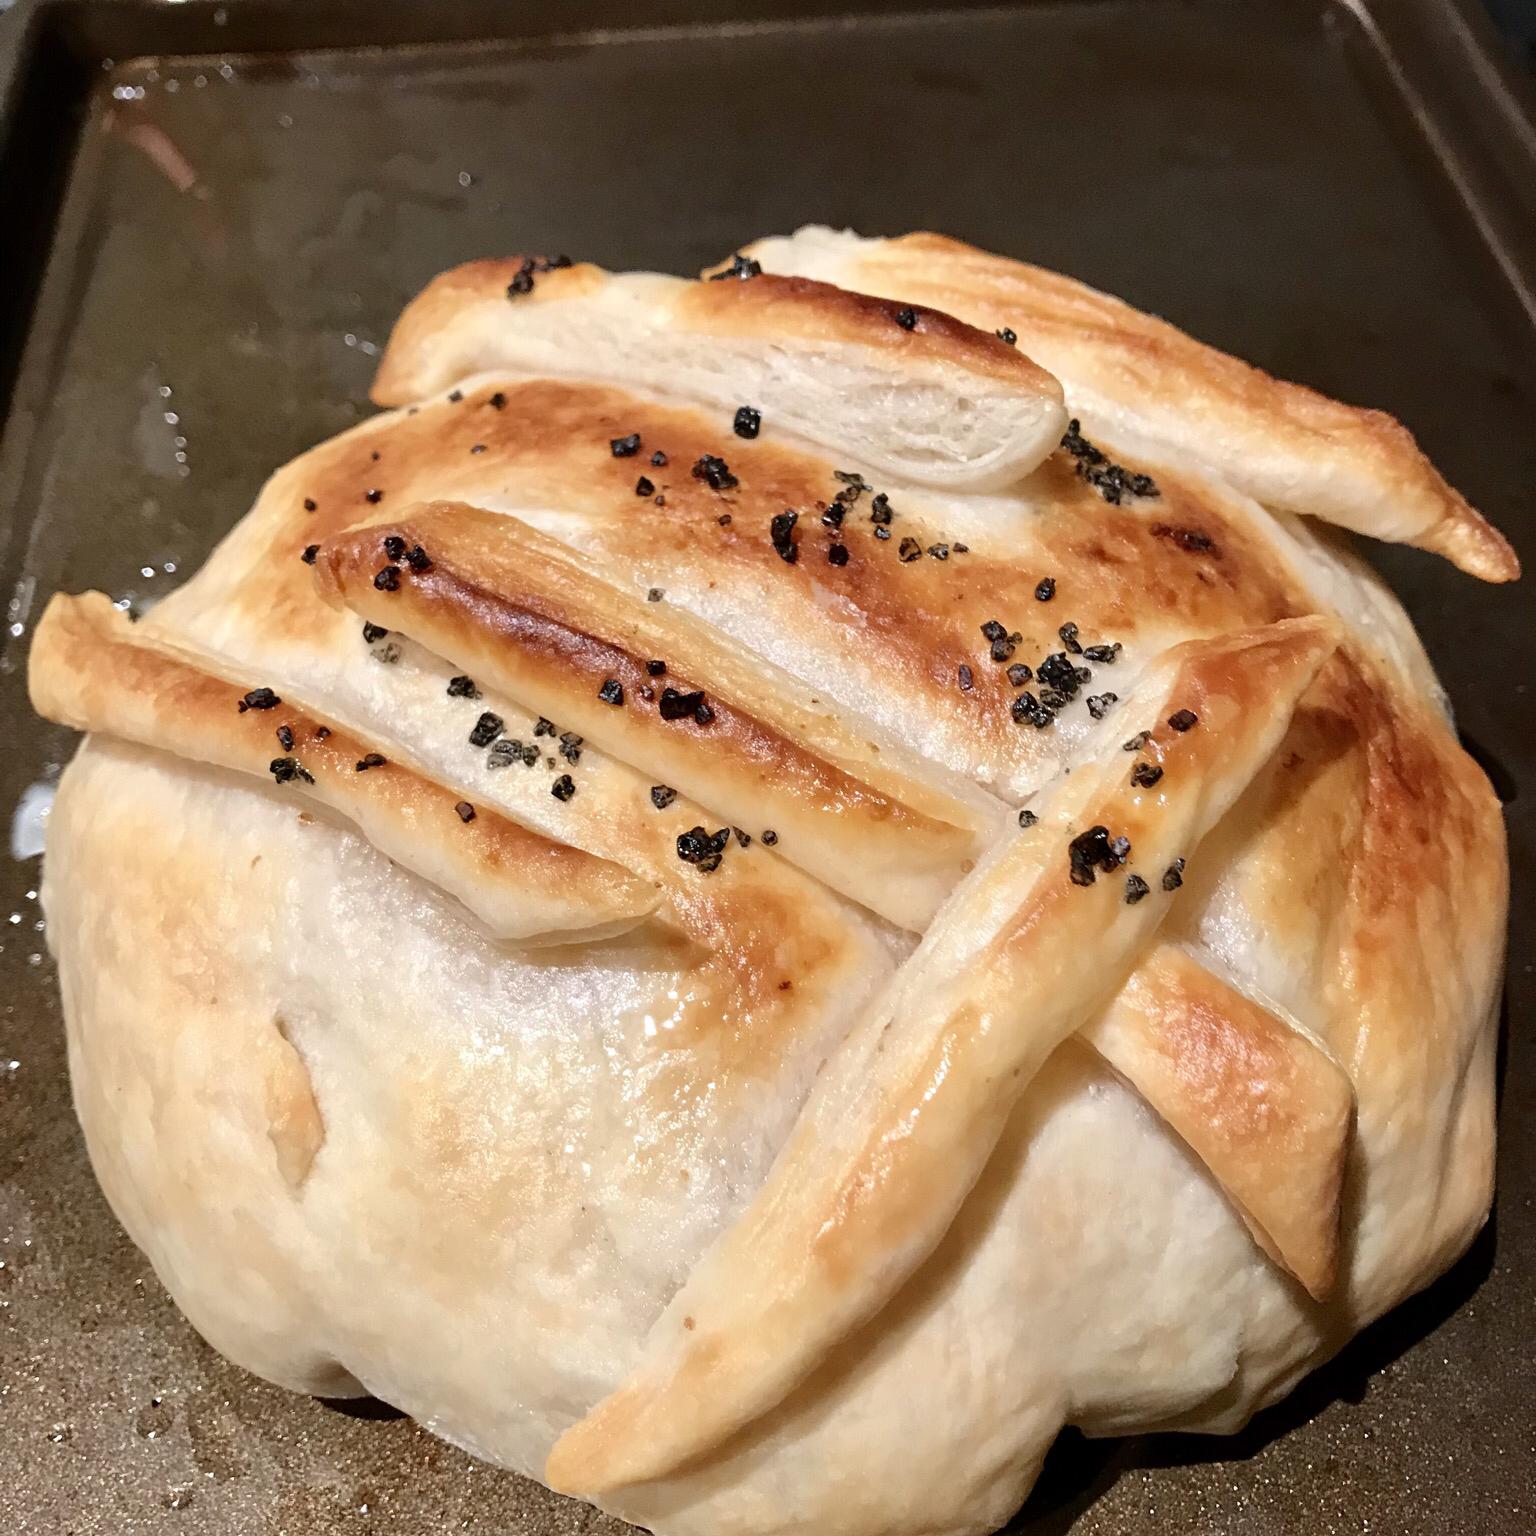 Jamie's Baked Brie B Starr